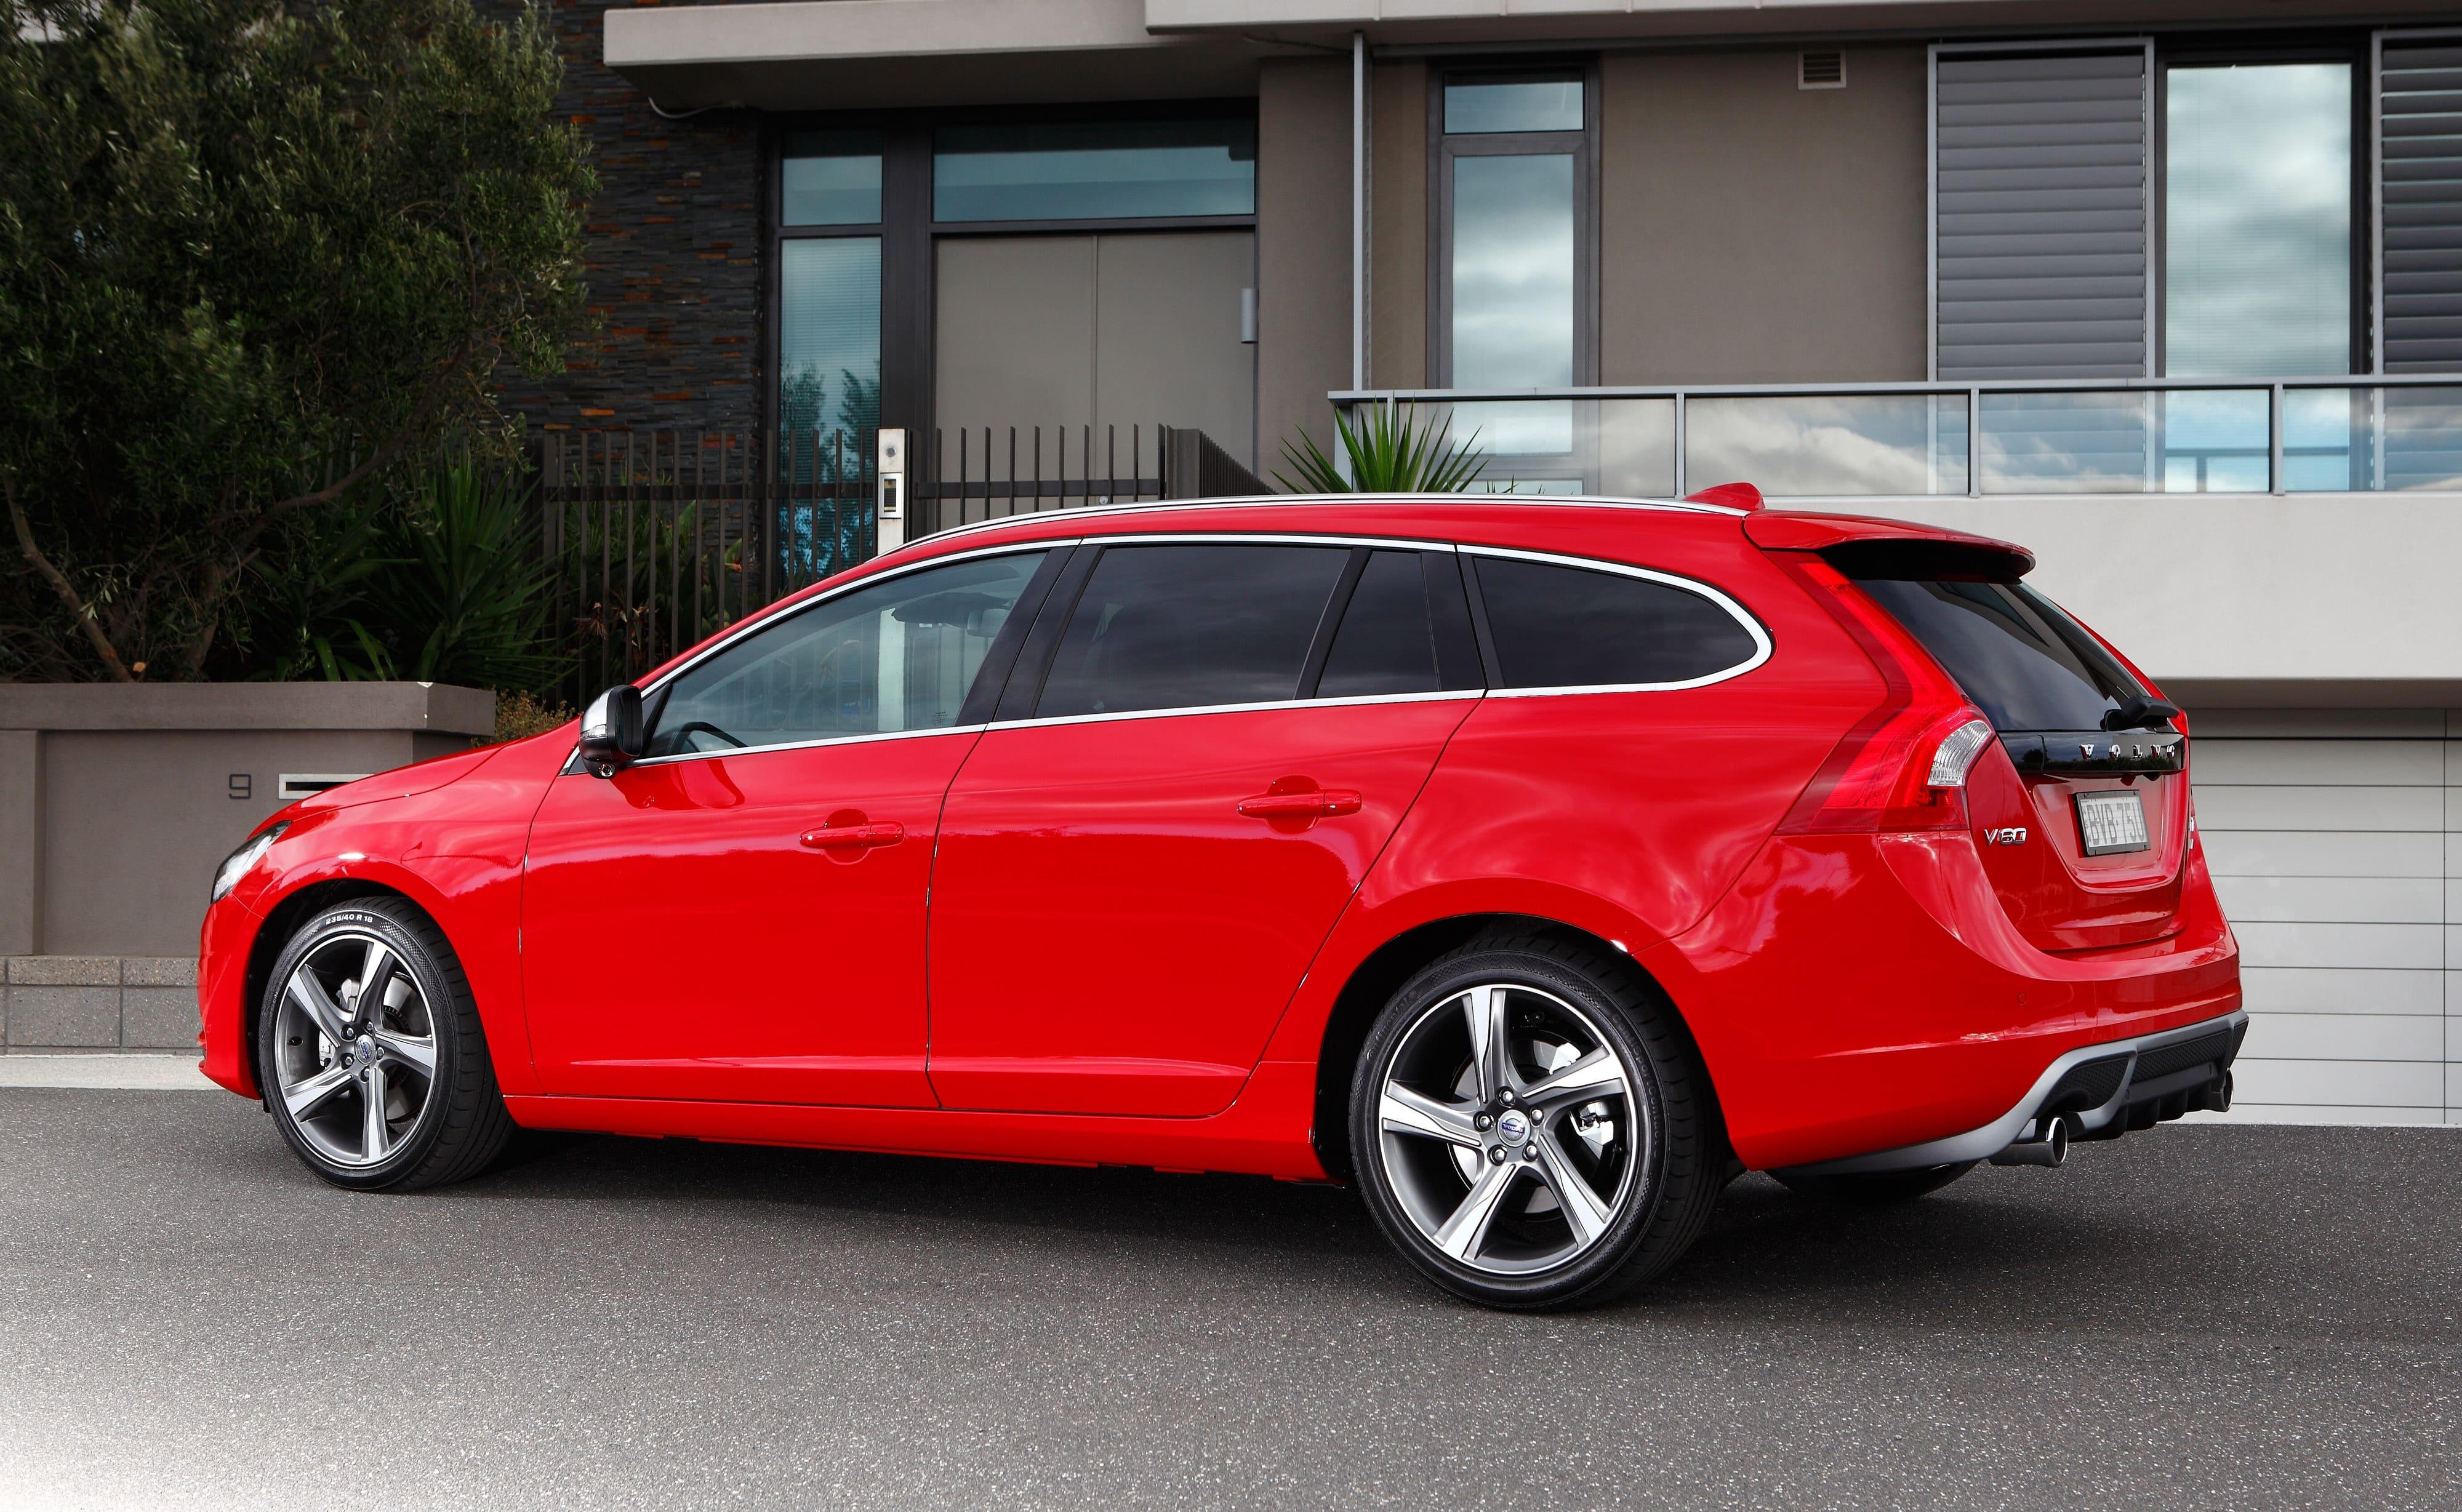 Volvo V60 rood achter schuin